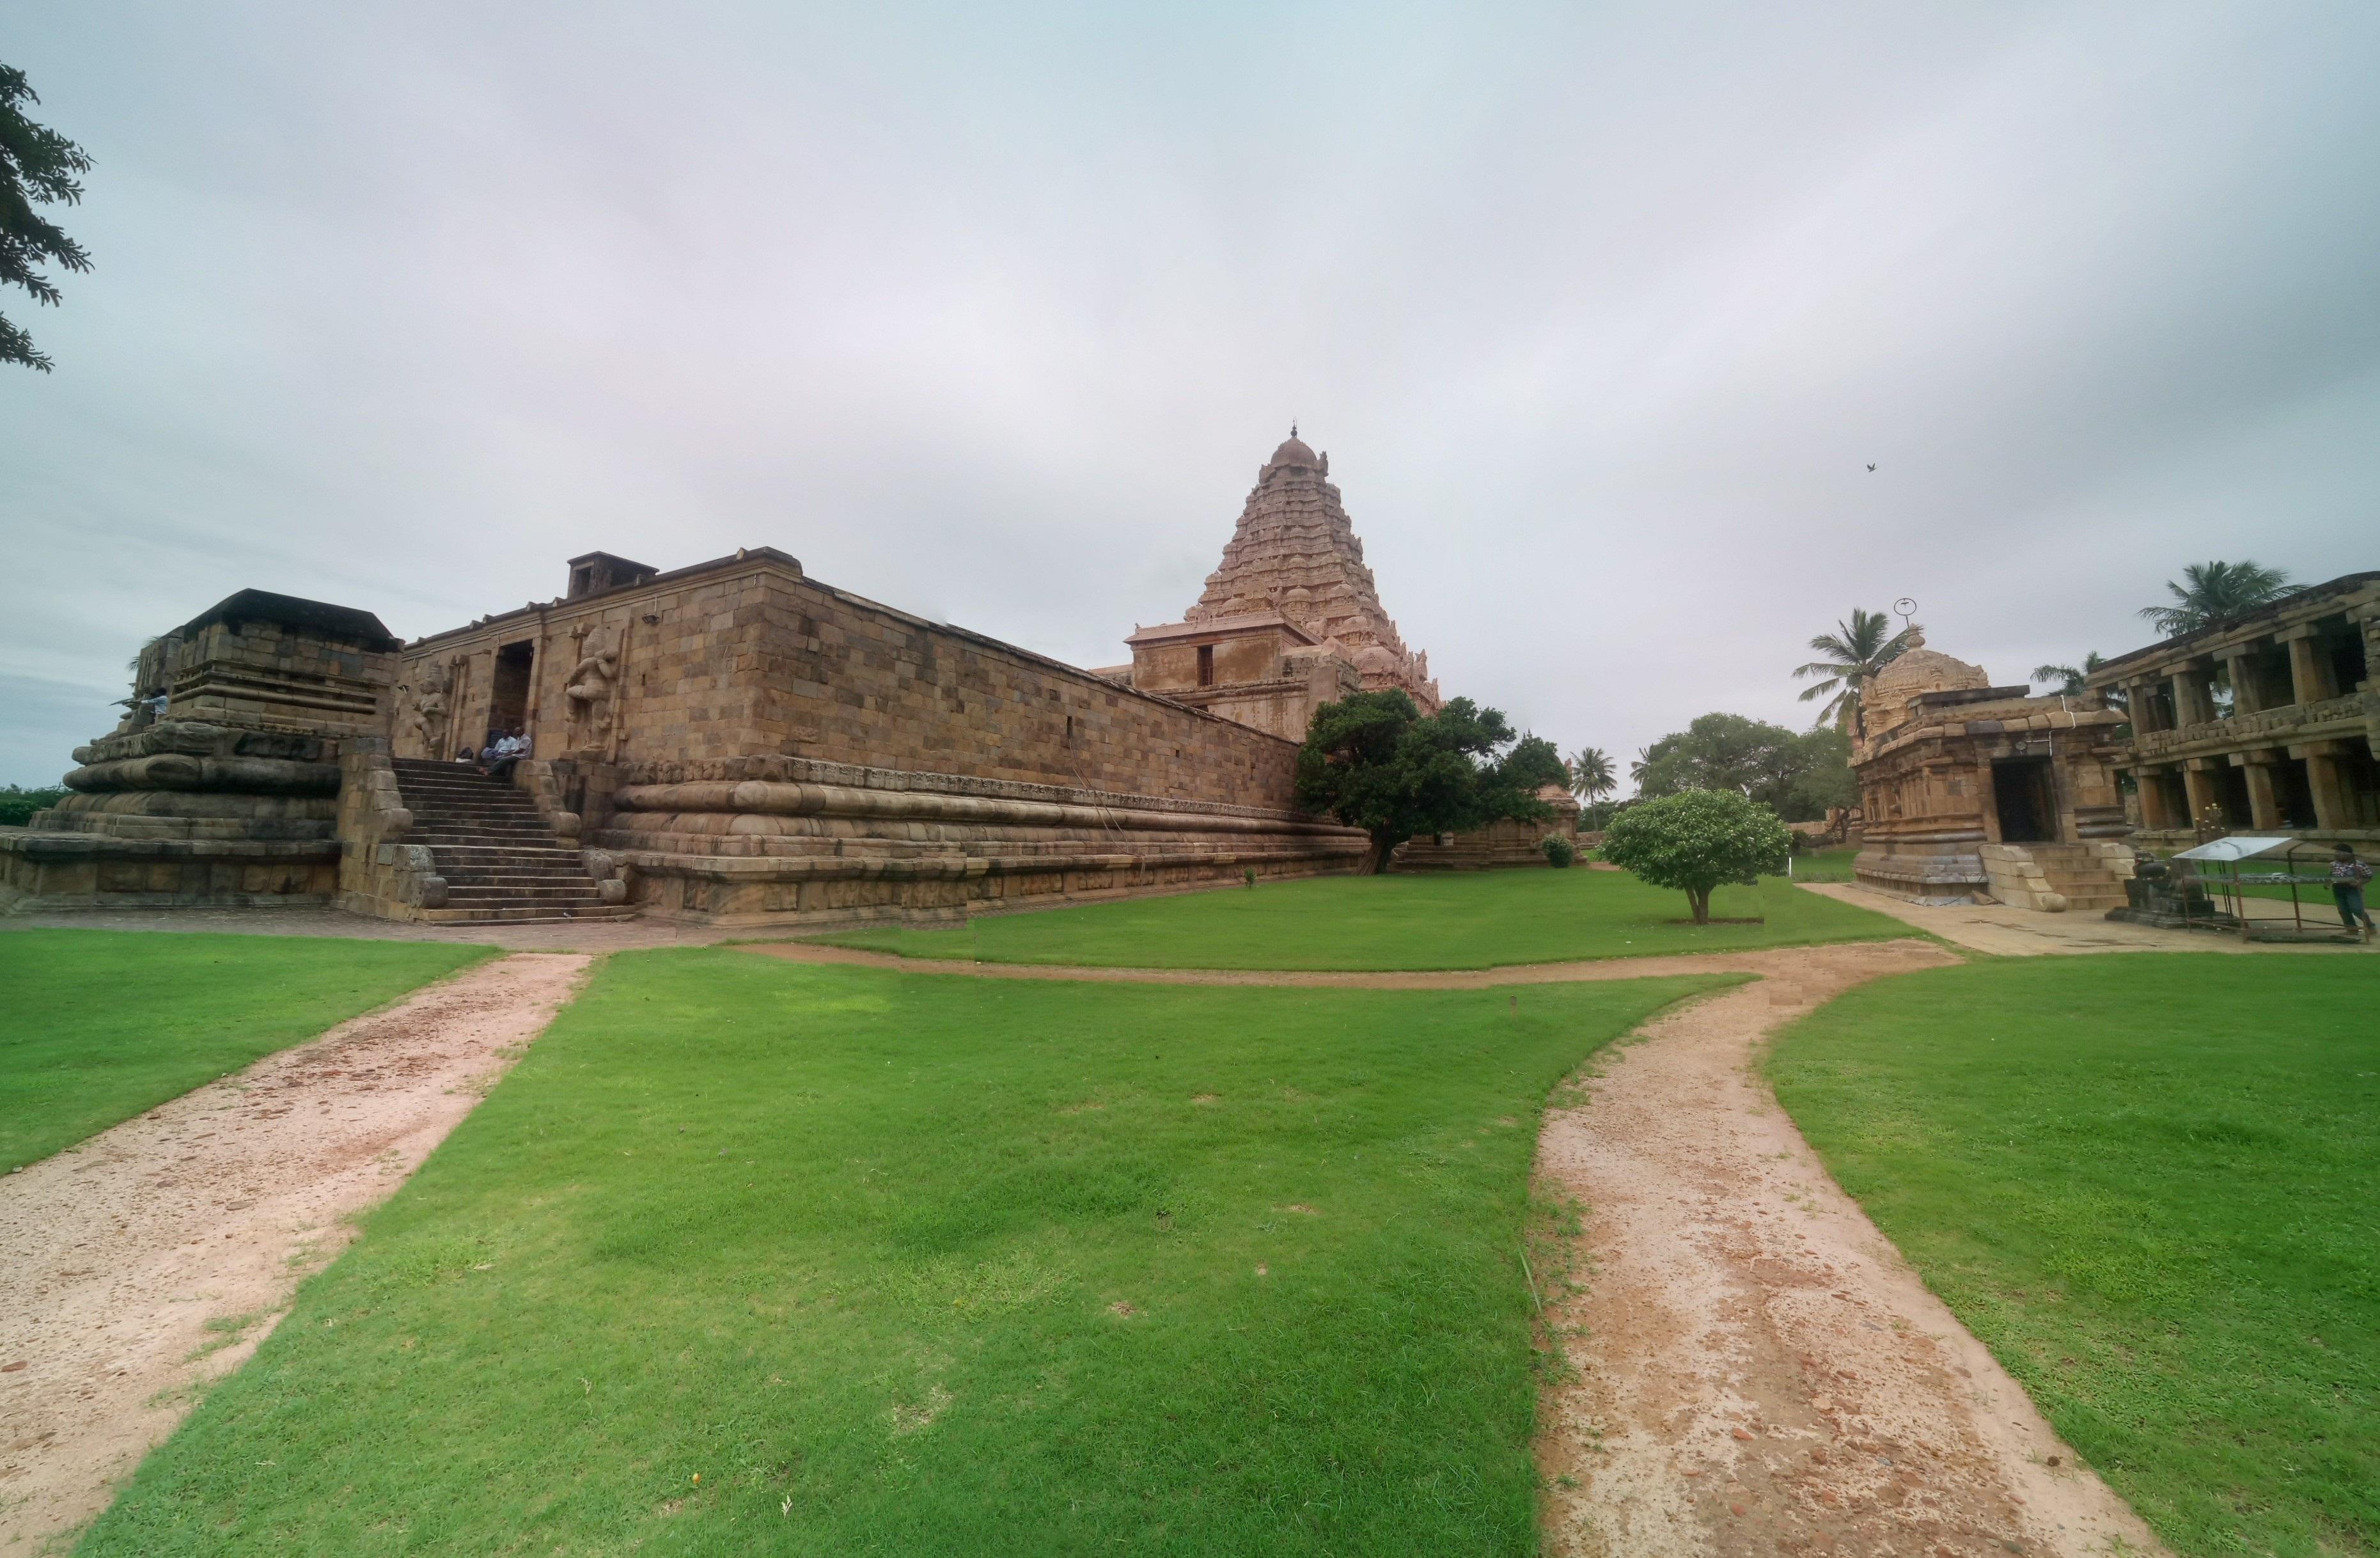 The Brihadeeshwara temple at Gangaikonda Cholapuram